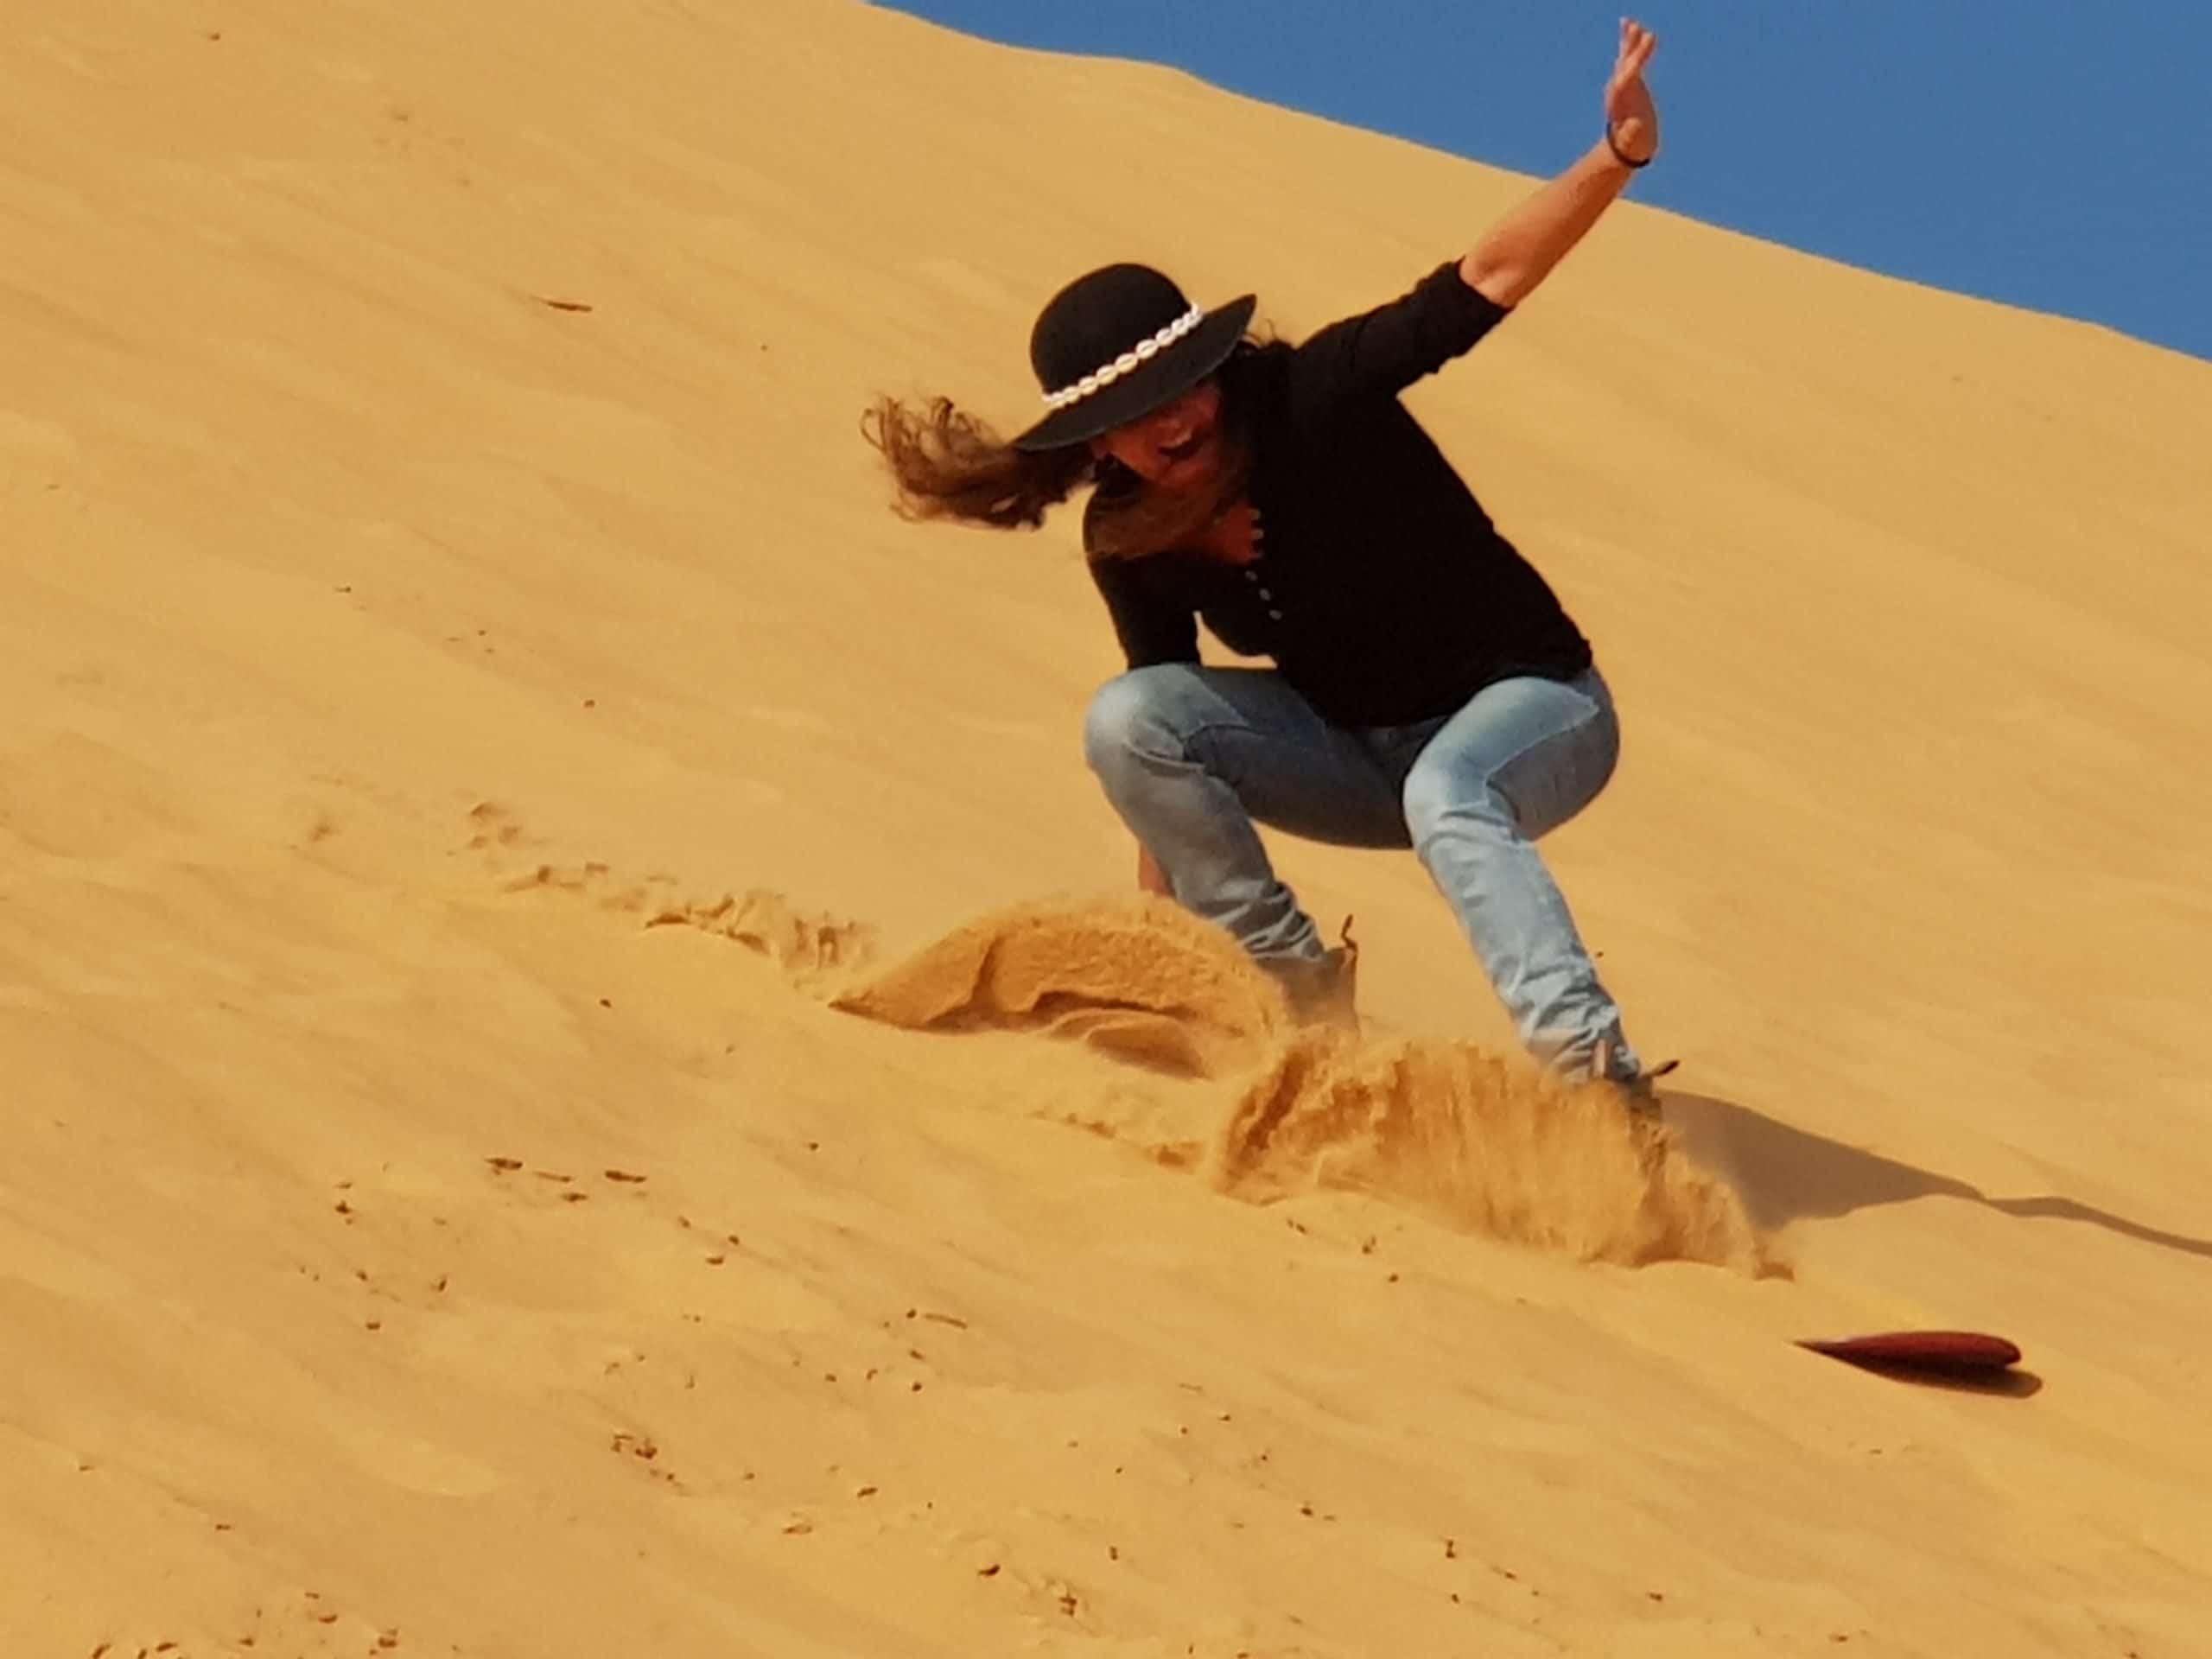 Sandboarding in Israel